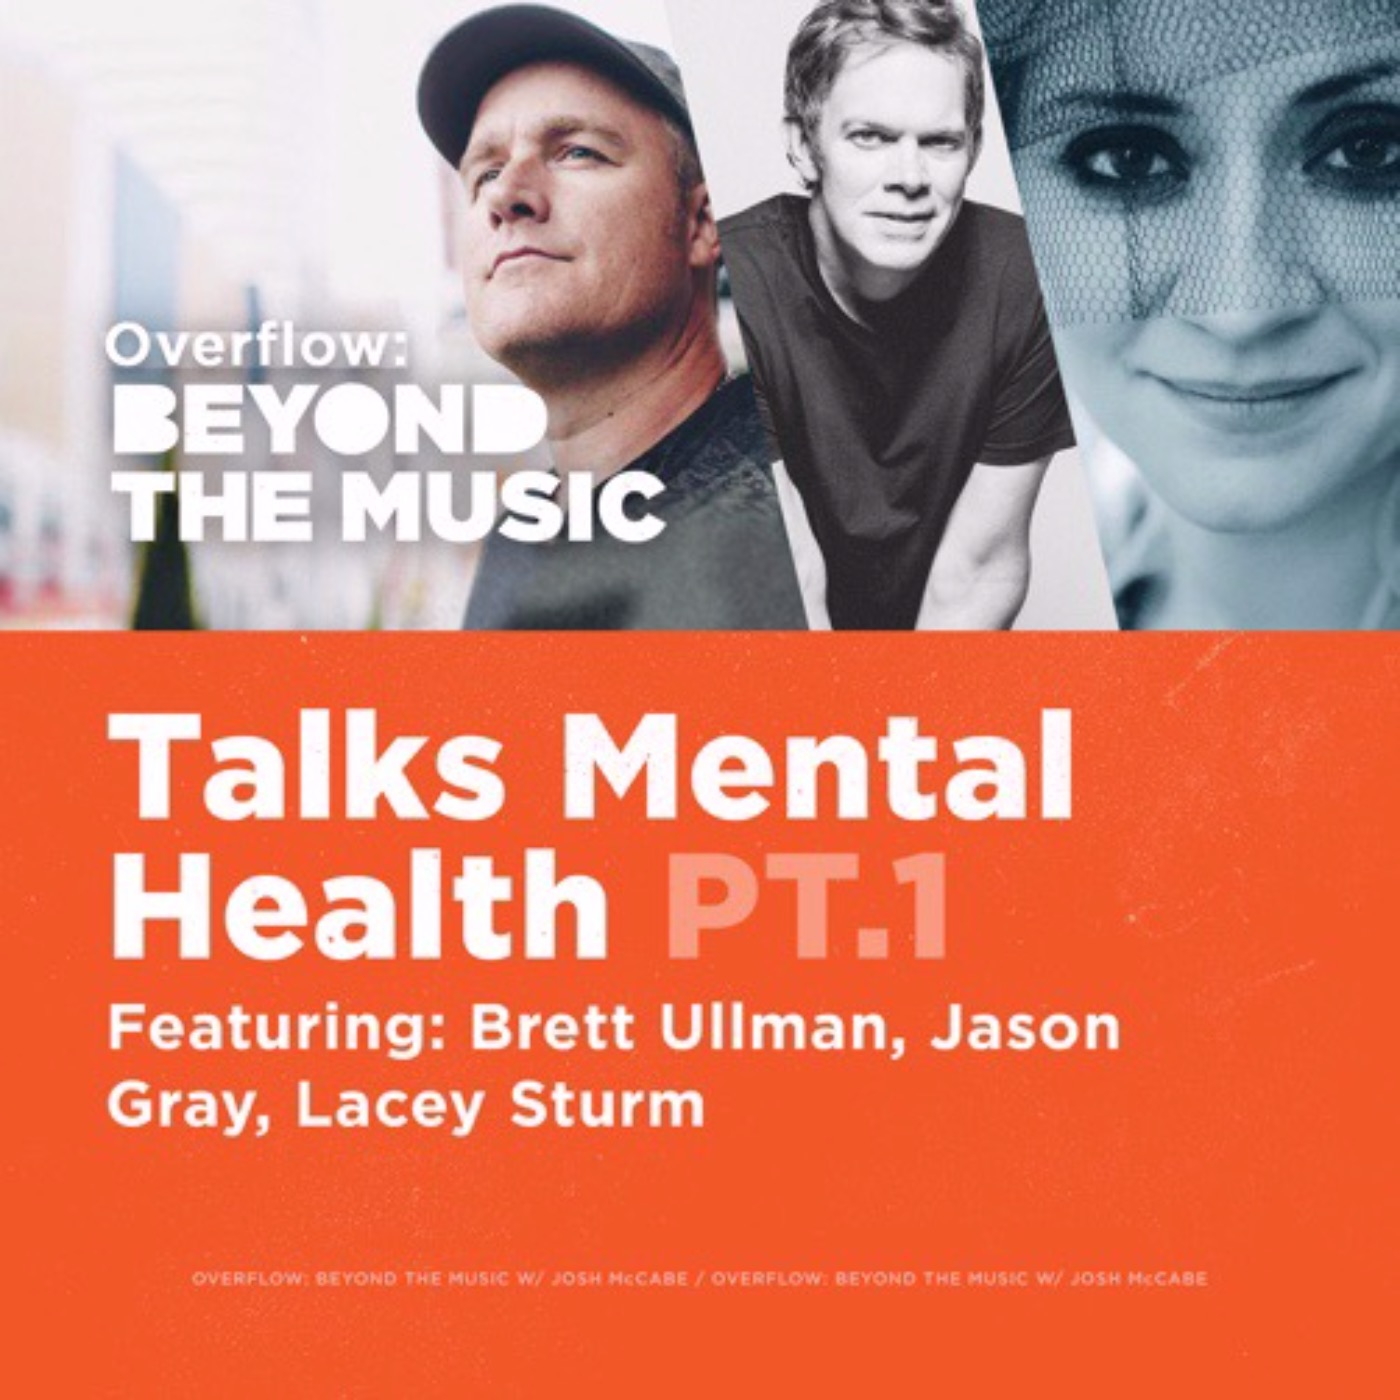 Talking Mental Health Part 1